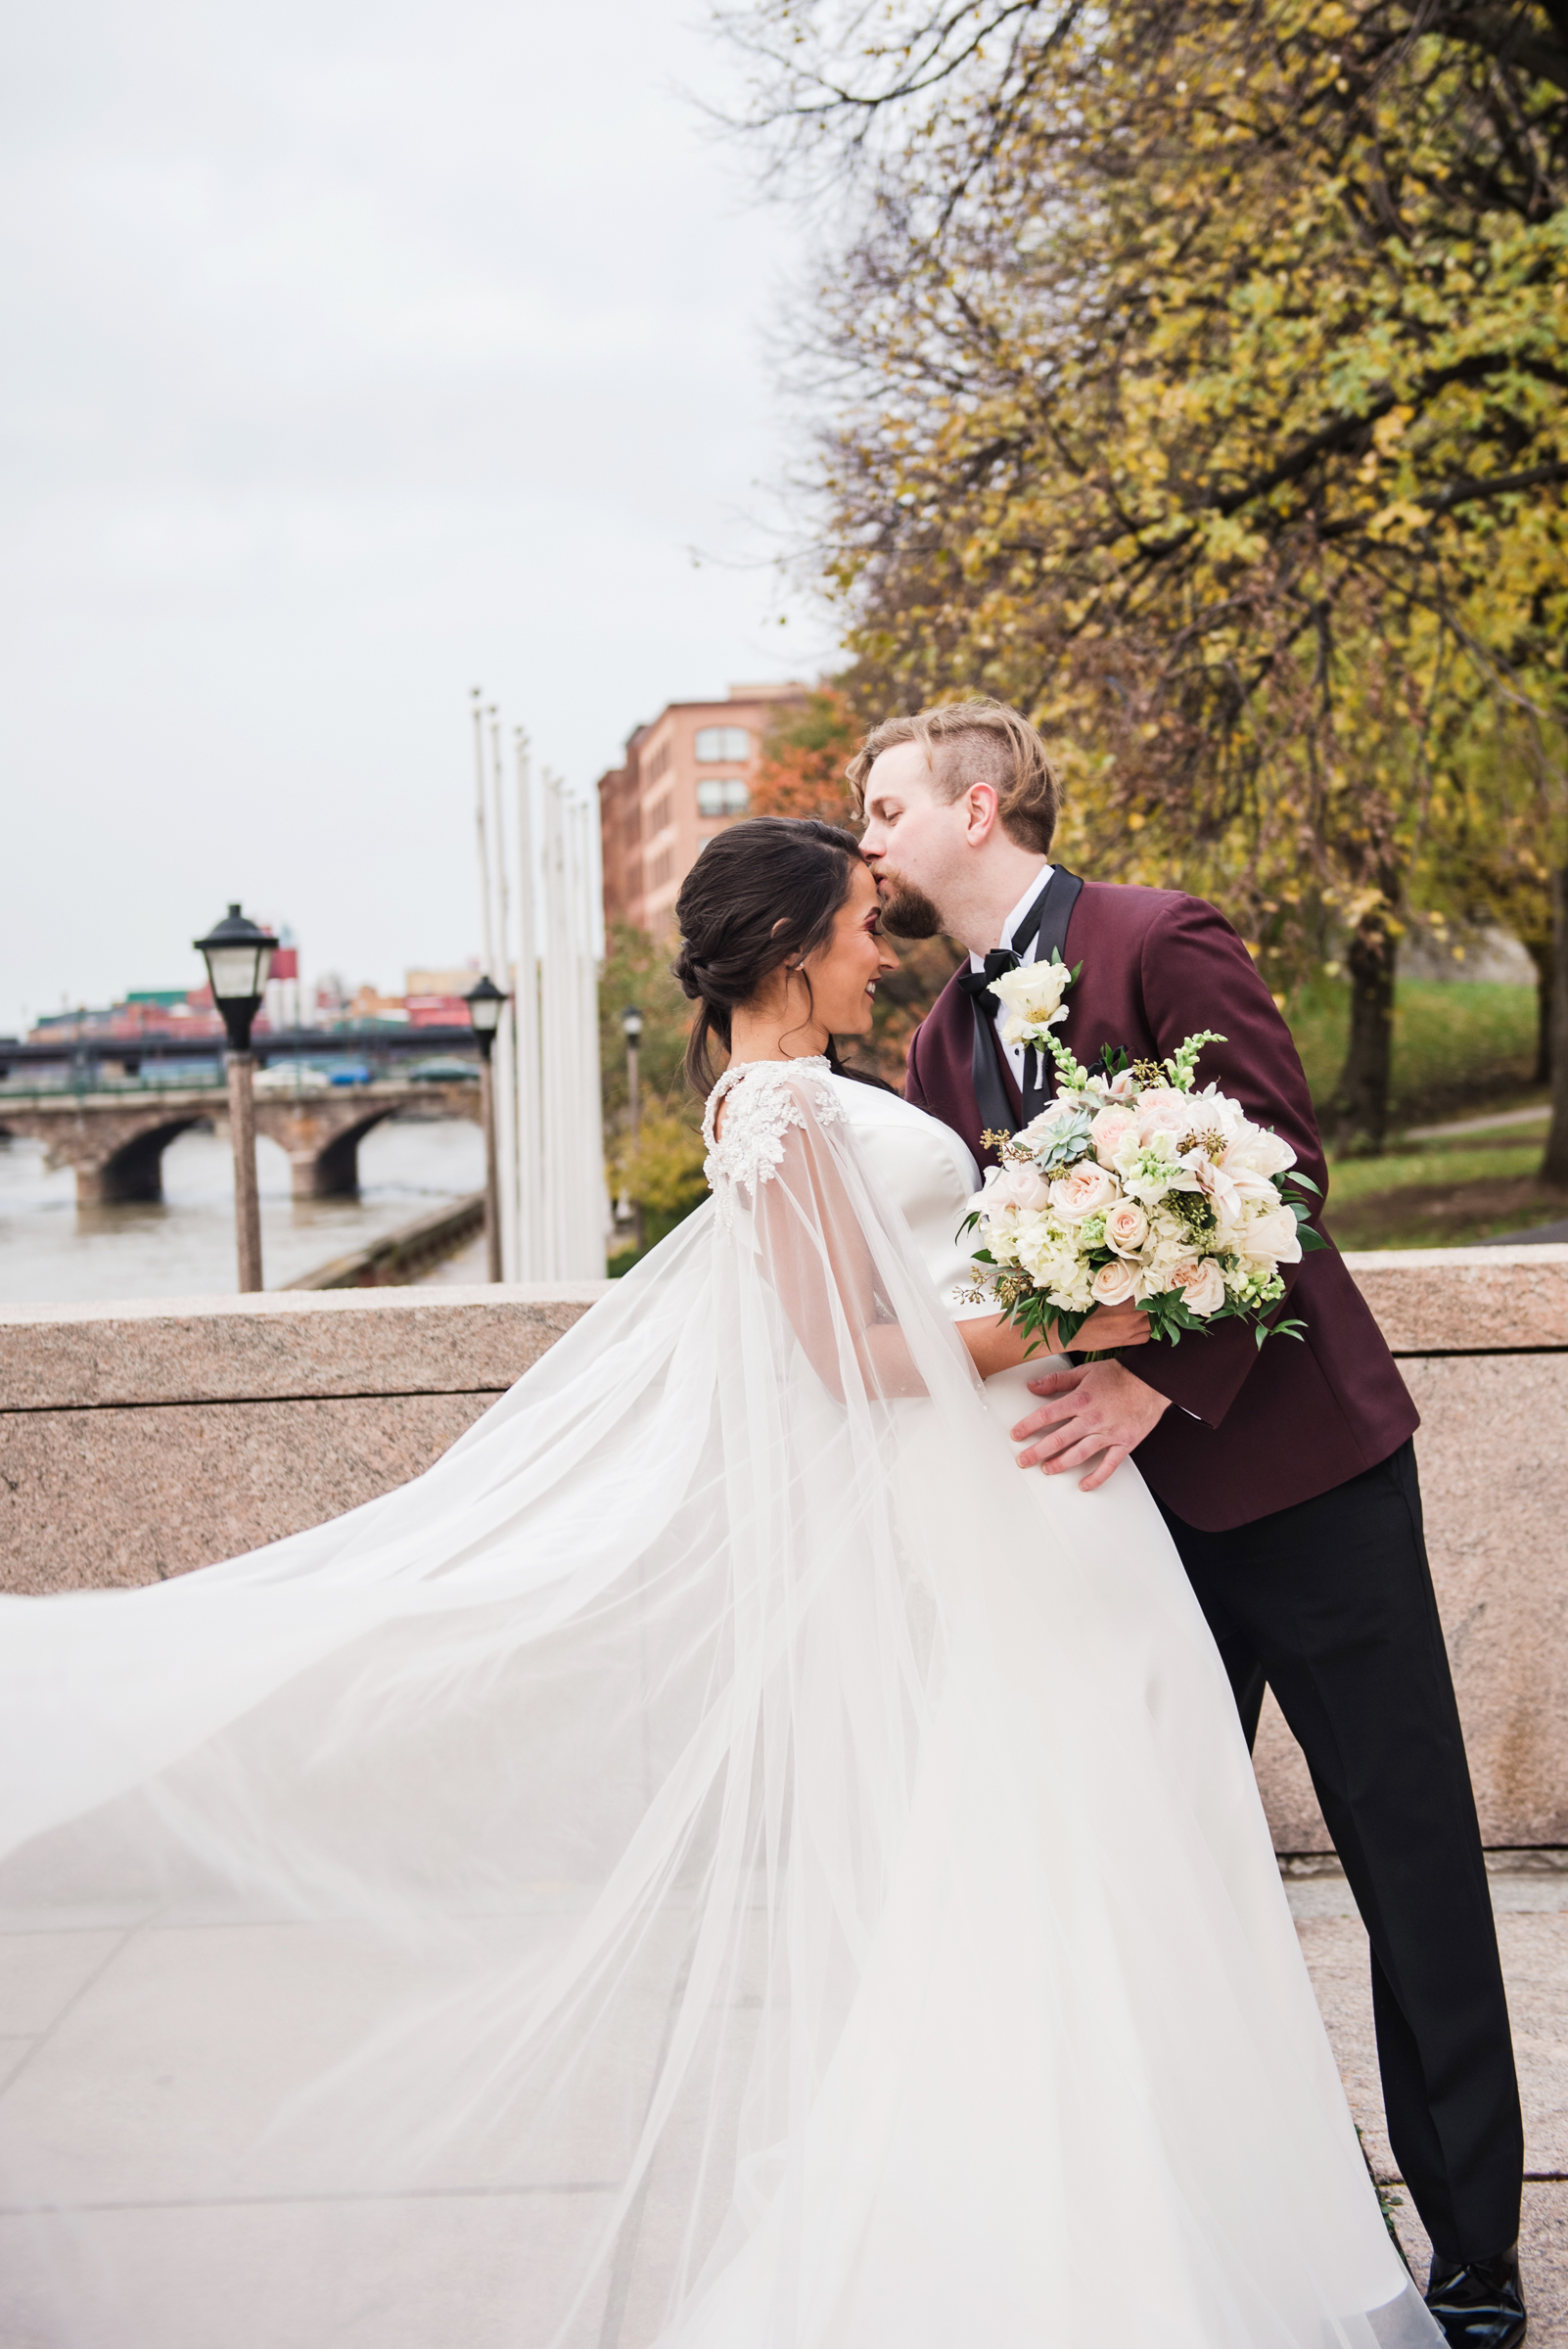 Wintergarden_by_Monroes_Rochester_Wedding_JILL_STUDIO_Rochester_NY_Photographer_164023.jpg